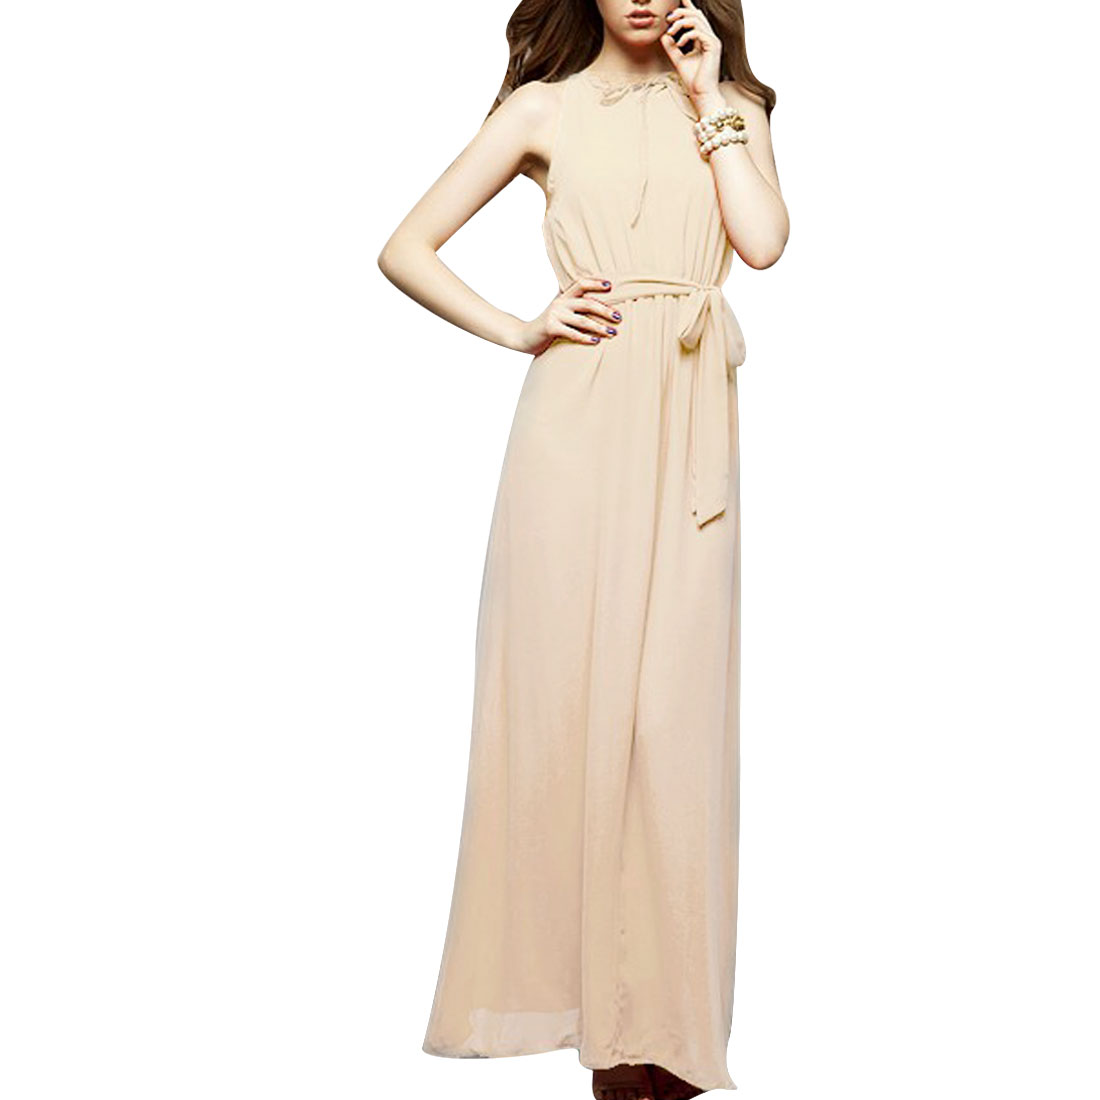 Women Beige M Halter Neck Elastic Waist Off Shoulder Design Pullover Dress